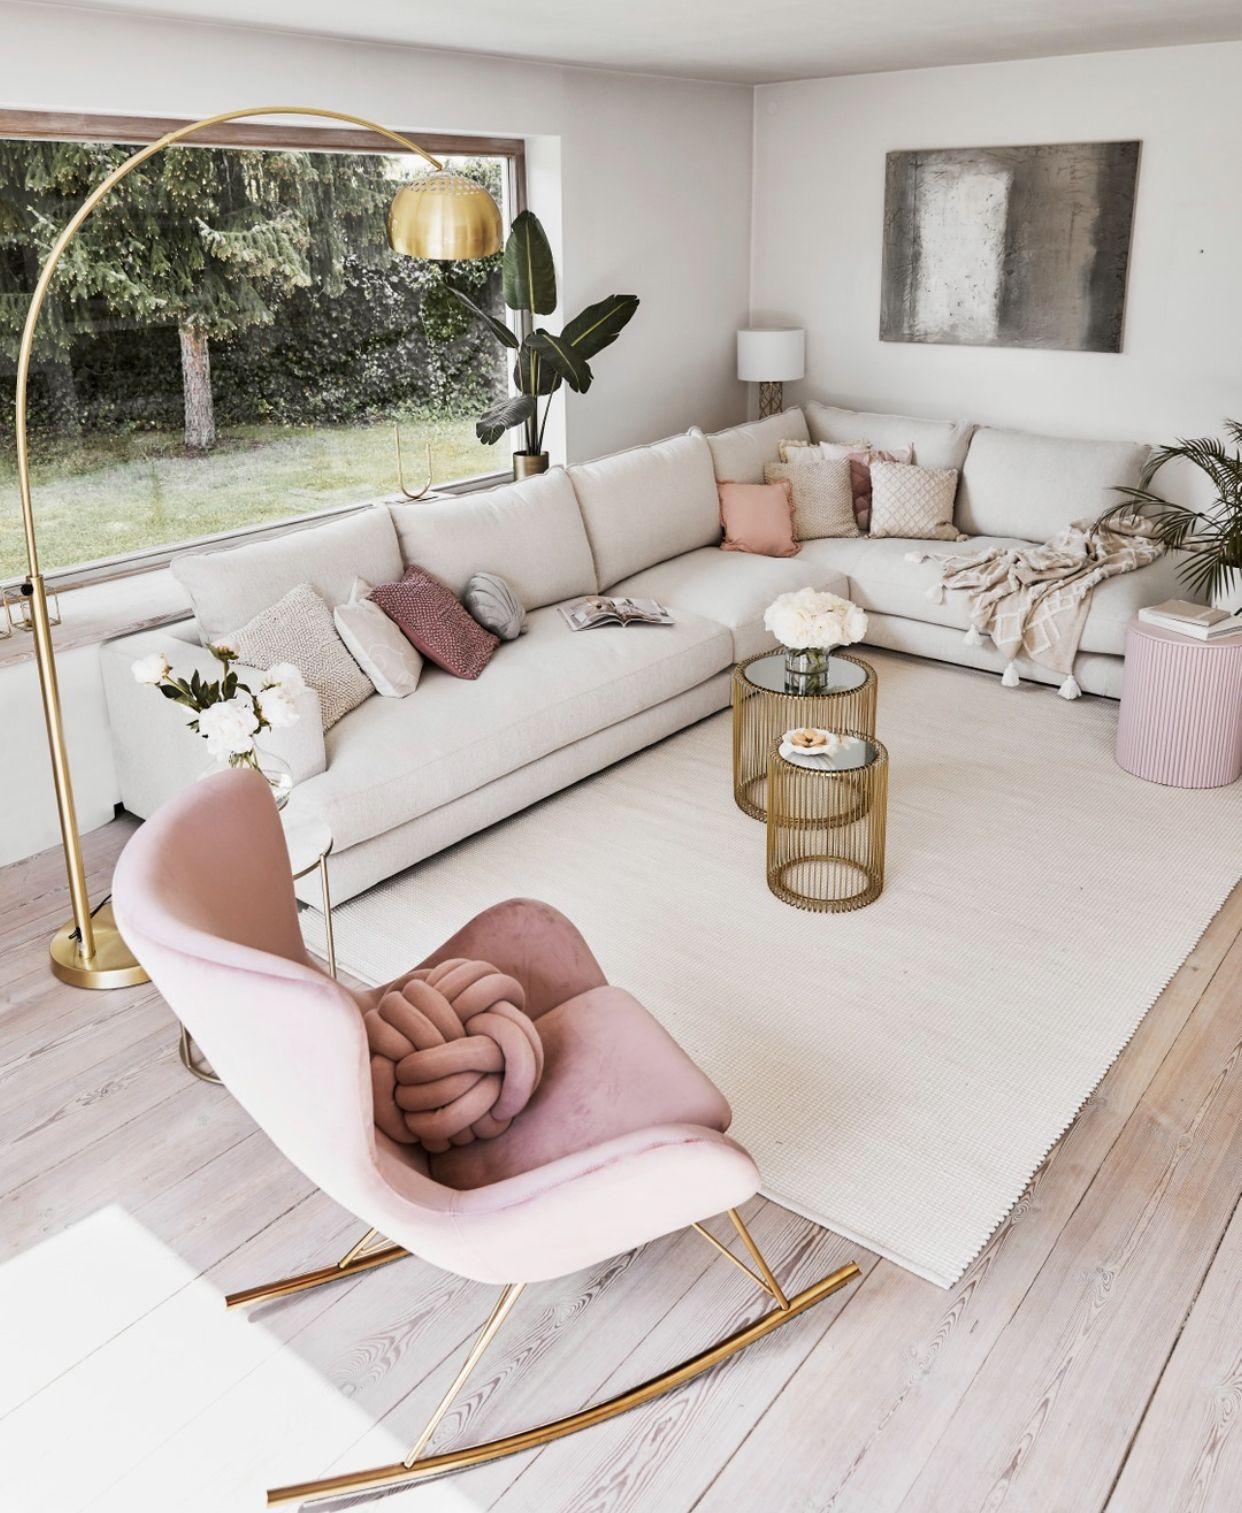 Pin by Priska on Decor Ideas   Living room decor inspiration ...